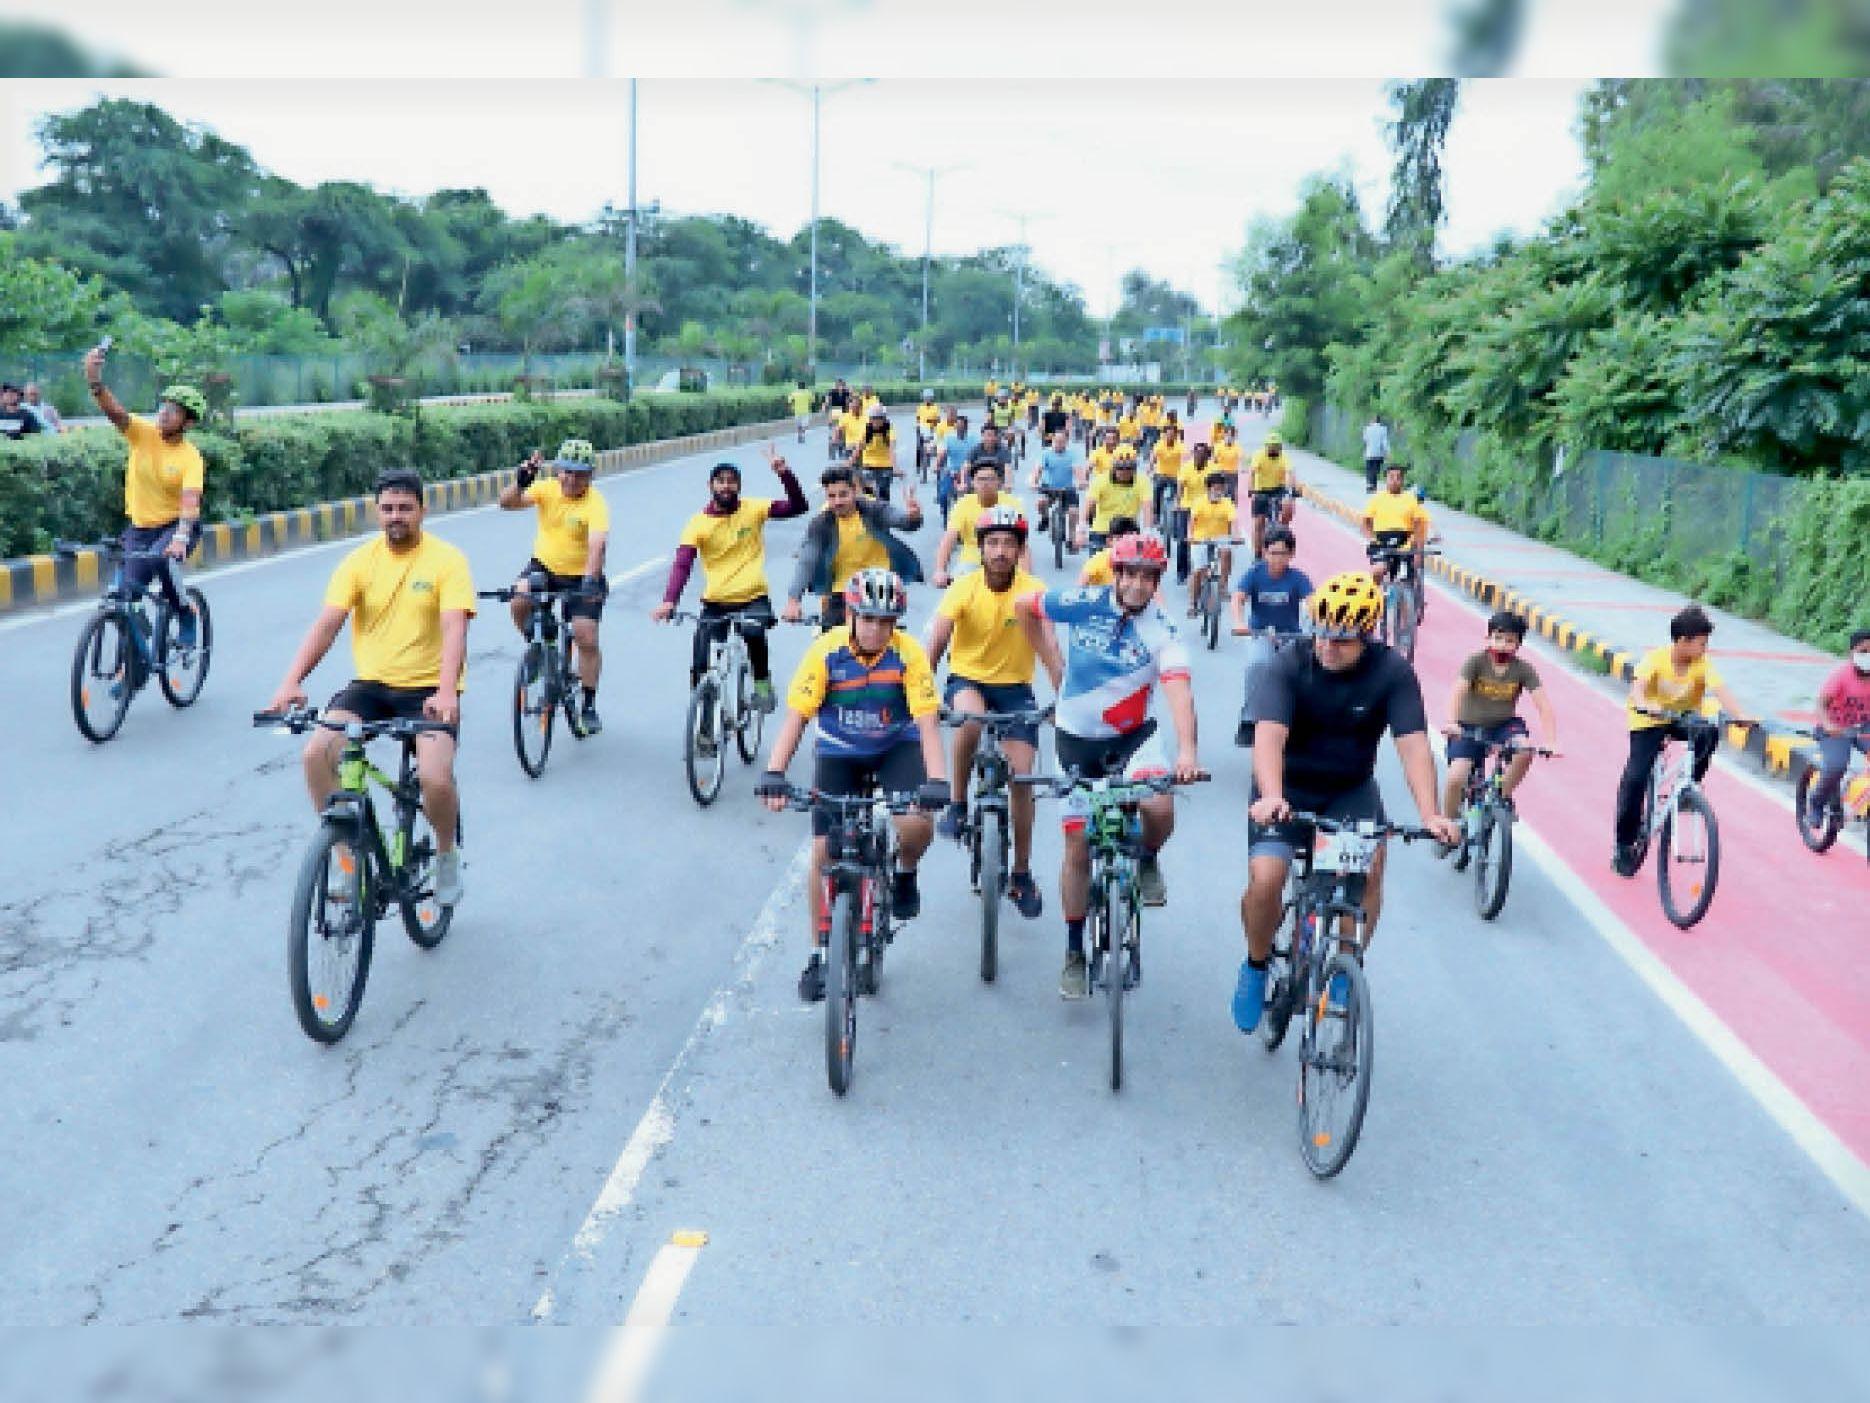 करनाल. जेसीआई करनाल सिटी ने फिट इंडिया हिट इंडिया के तहत साइकिल रैली में युवा हिस्सा लेते हुए। - Dainik Bhaskar